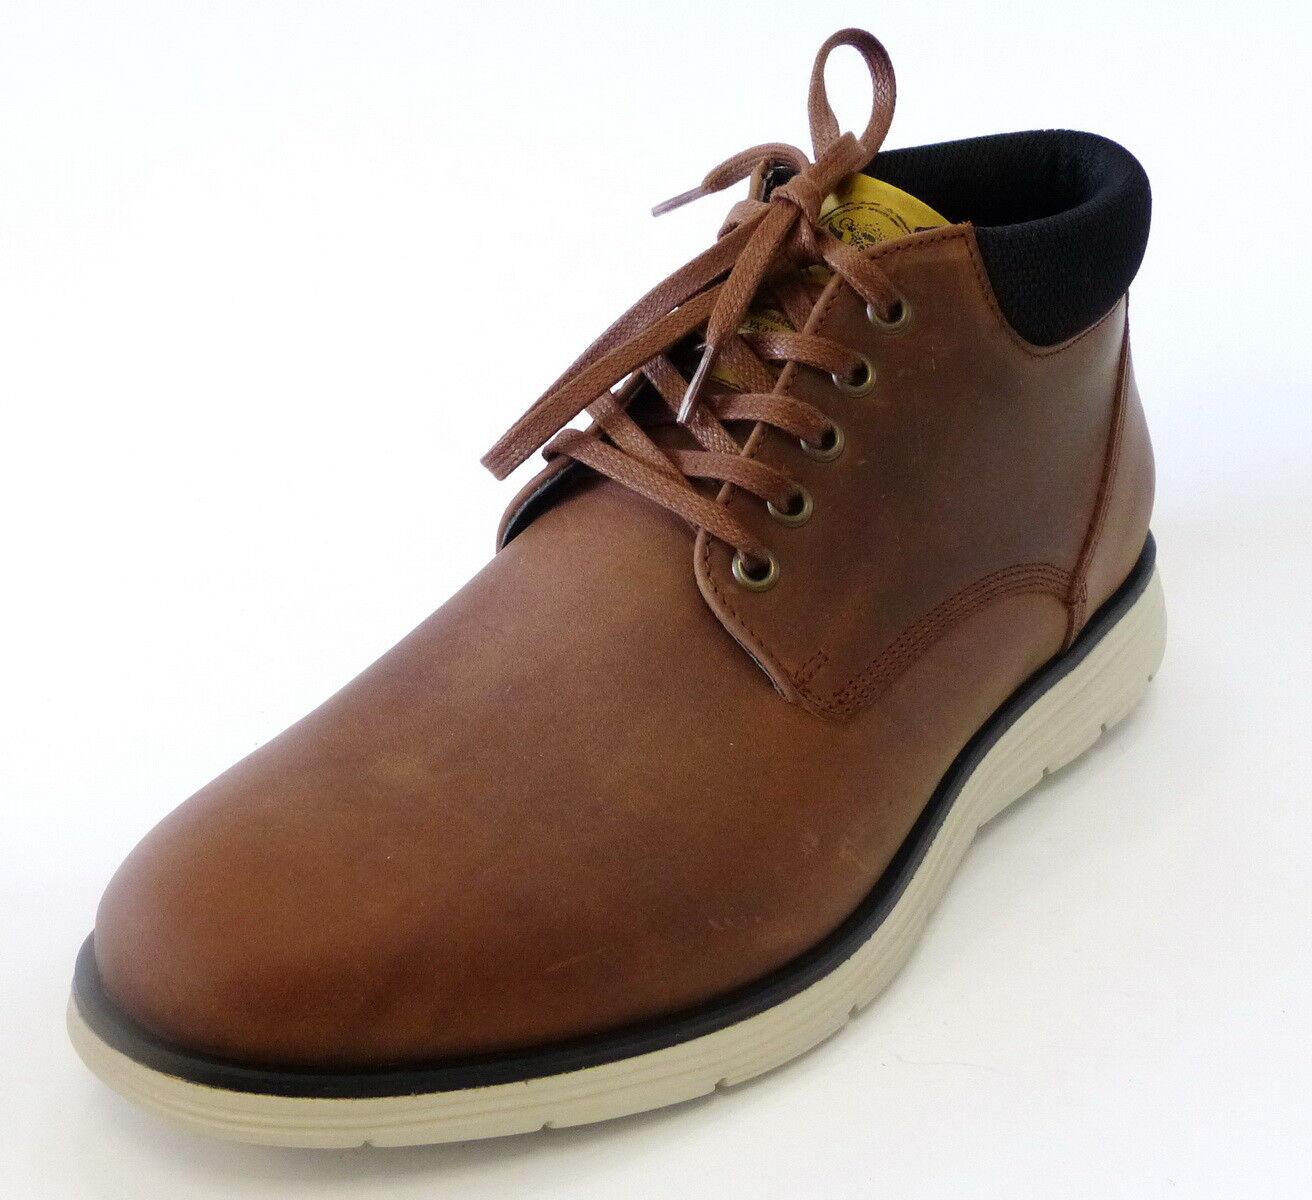 Lloyd Boot Sneaker Bernie 27-531-01 Wild Horse Reh schwarz braun